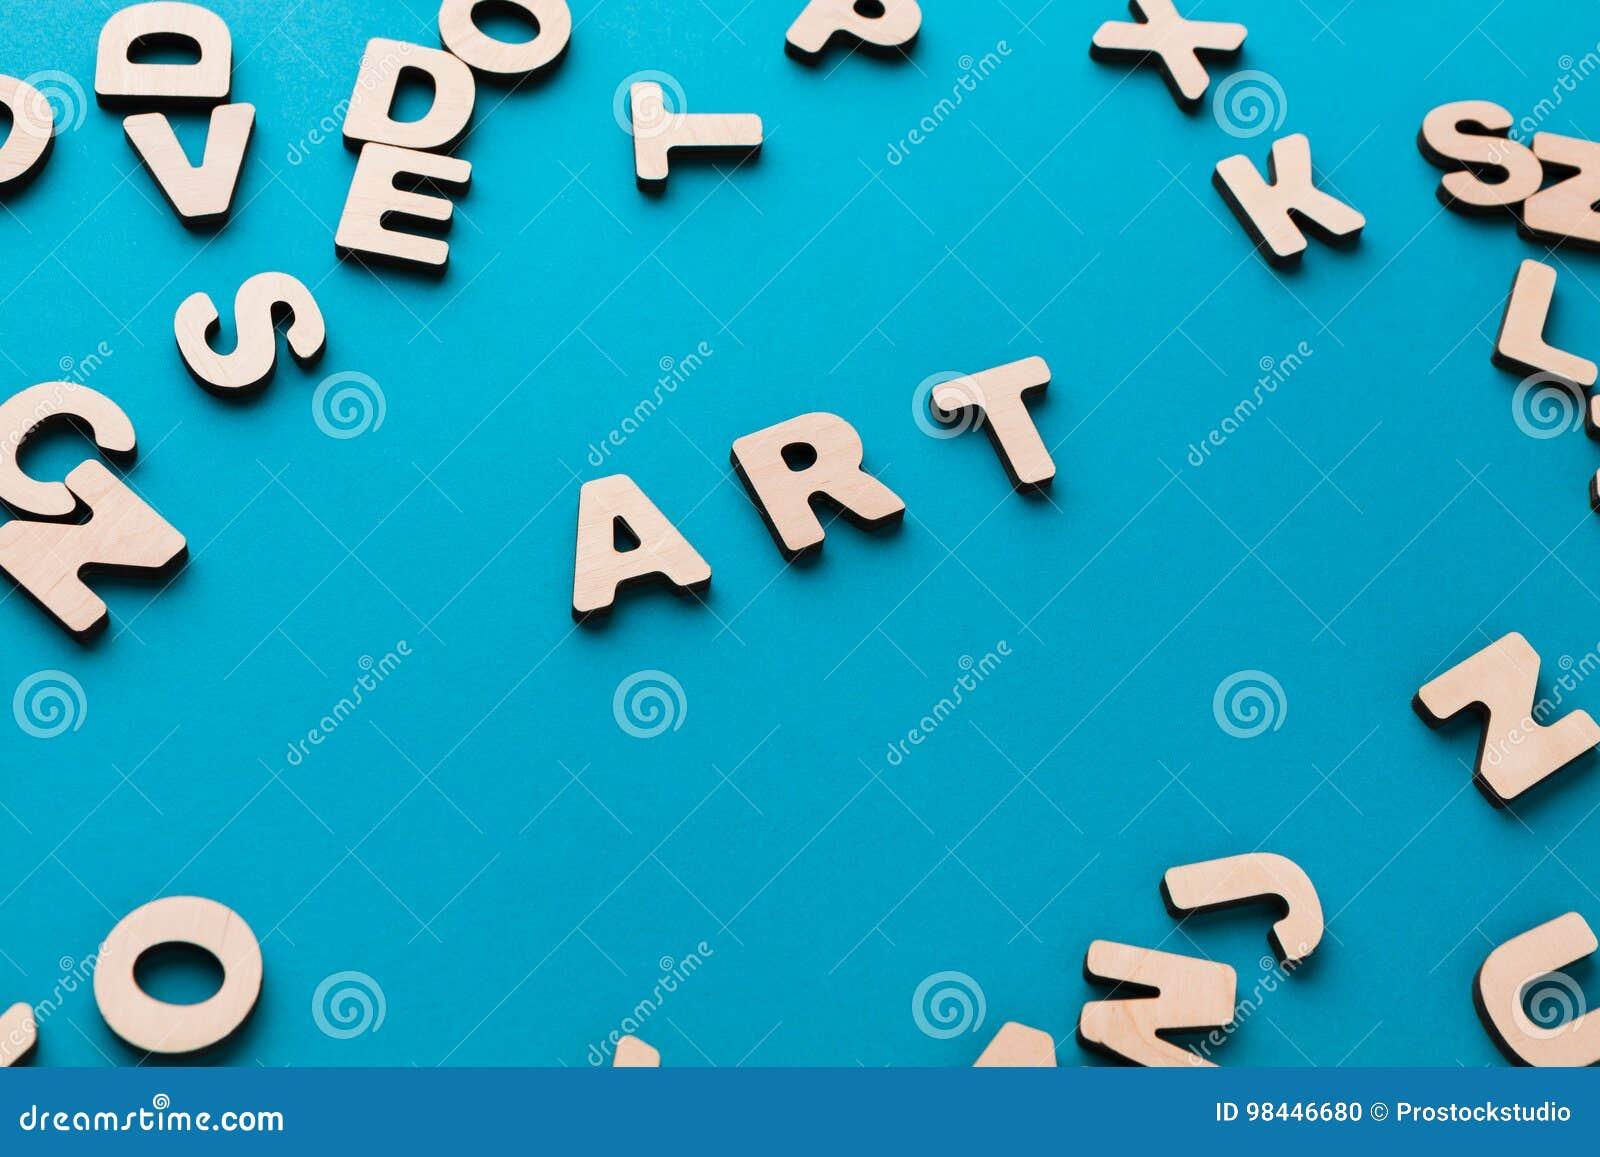 Word Art Blue Background Stock Image of sign craftsmanship